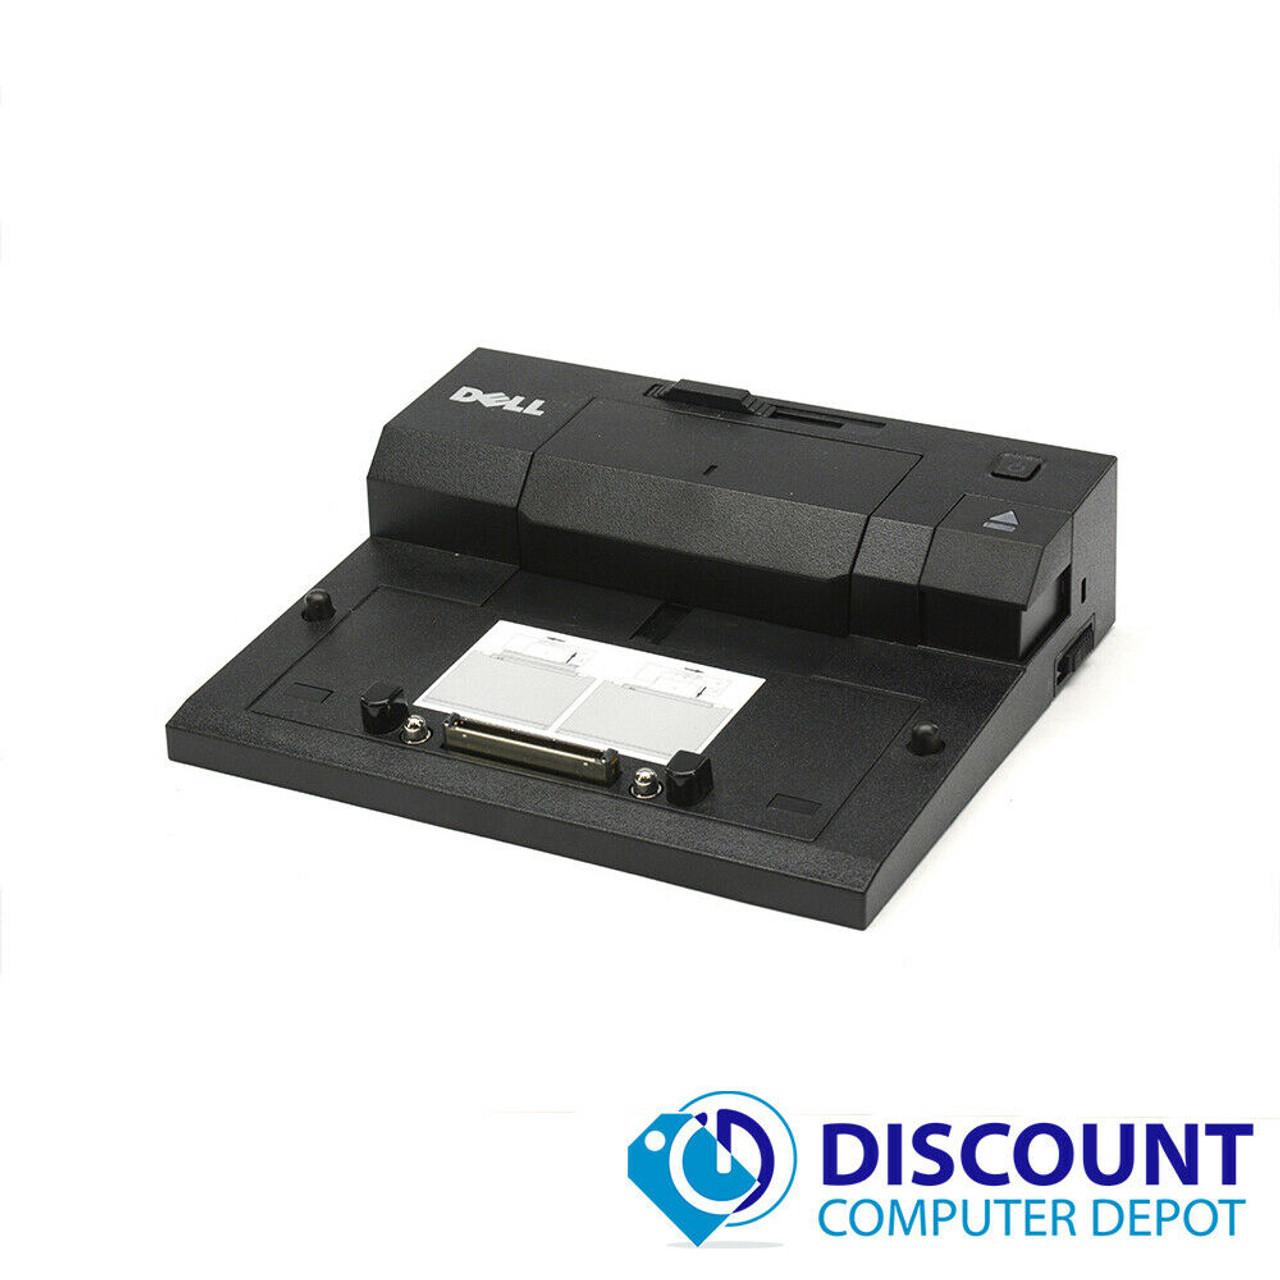 LOT 10 DELL E-Port II USB 3.0 Latitude Precision Laptop Dock Station Replicator